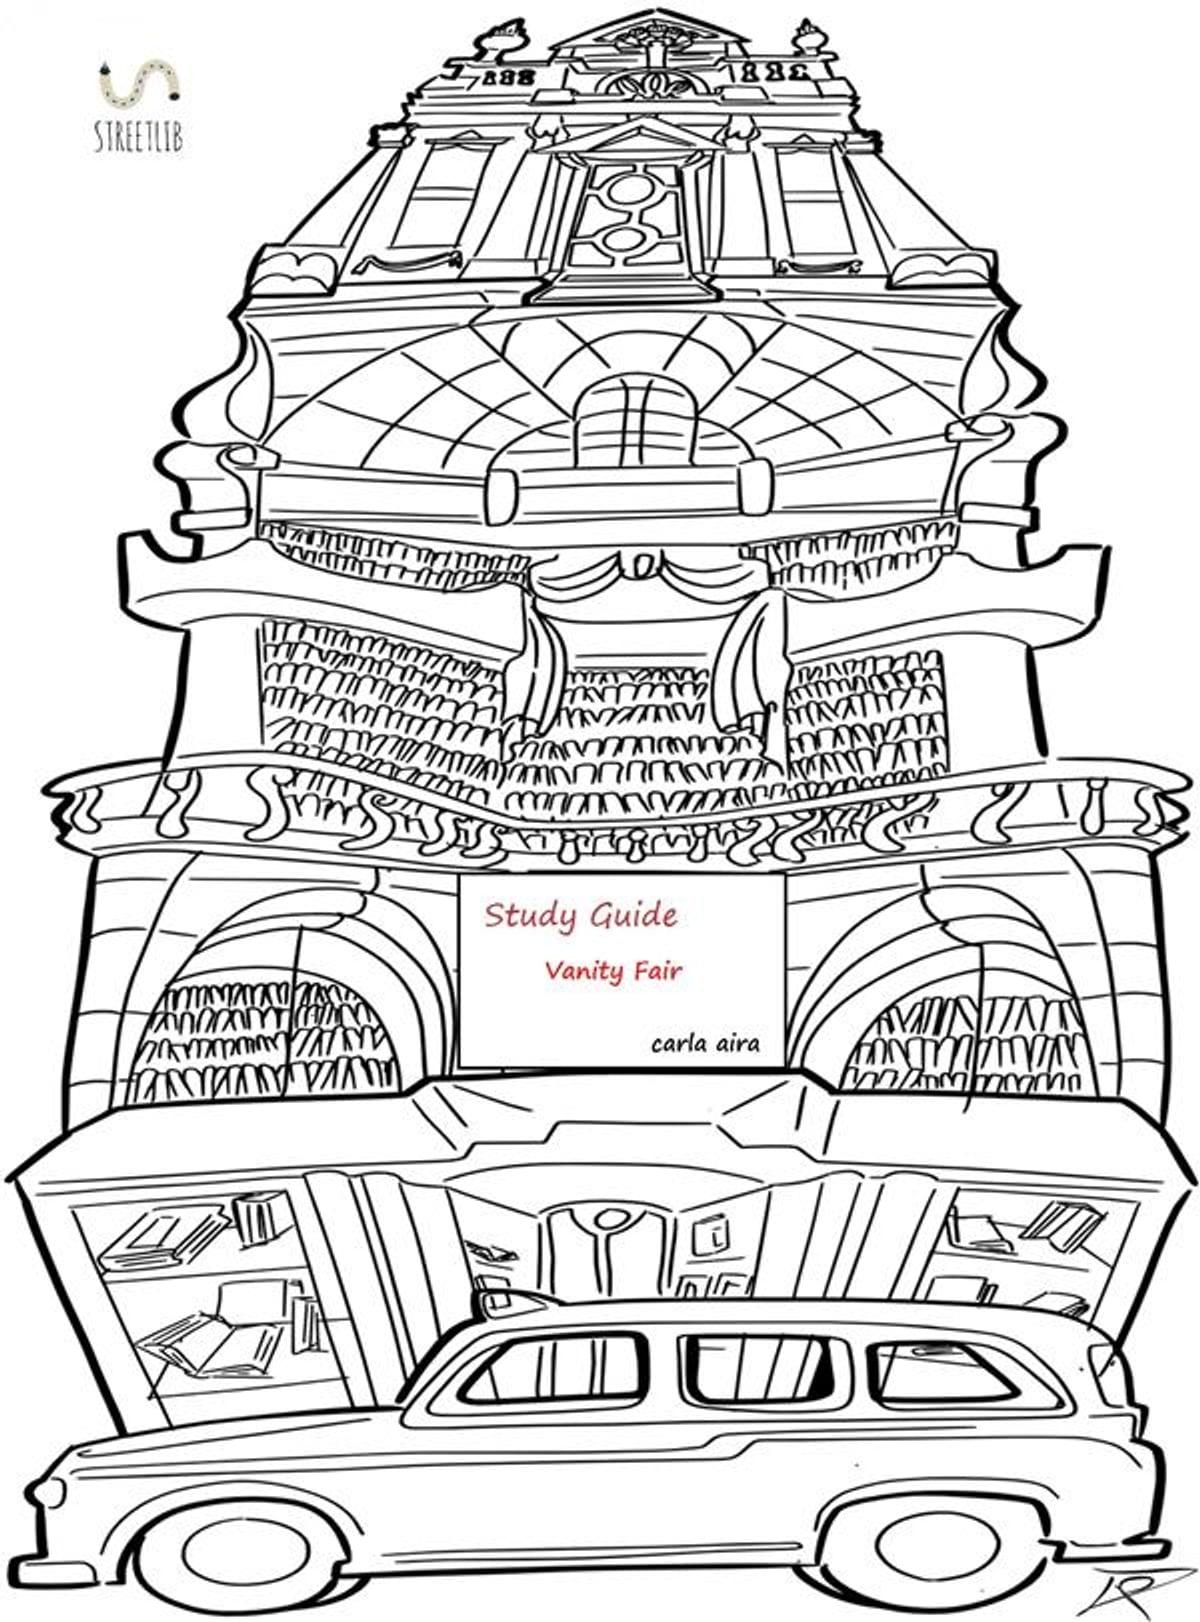 Study Guide Vanity Fair eBook by Carla Aira